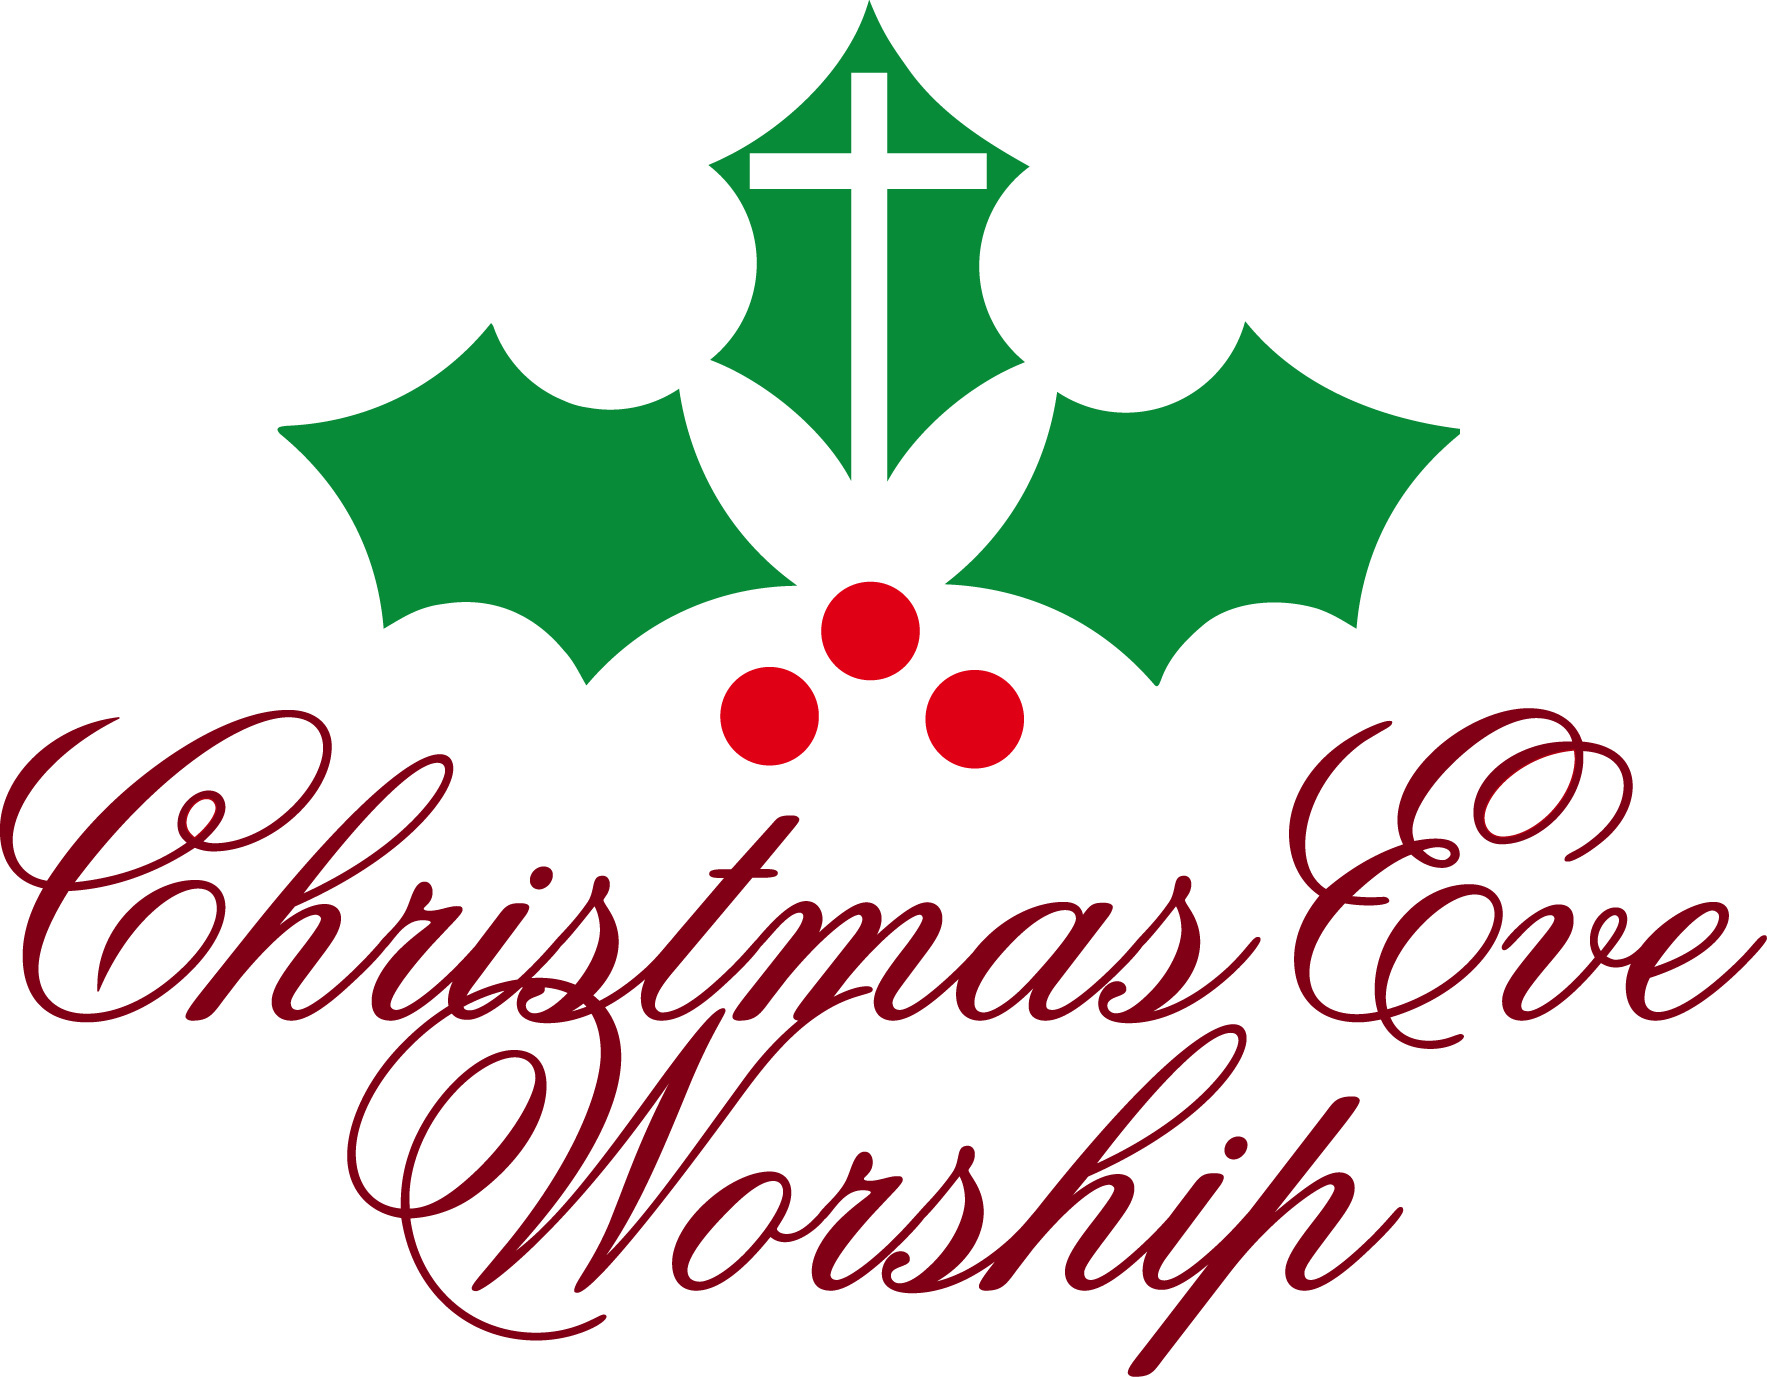 1767x1377 Christmas Eve Service Clipart